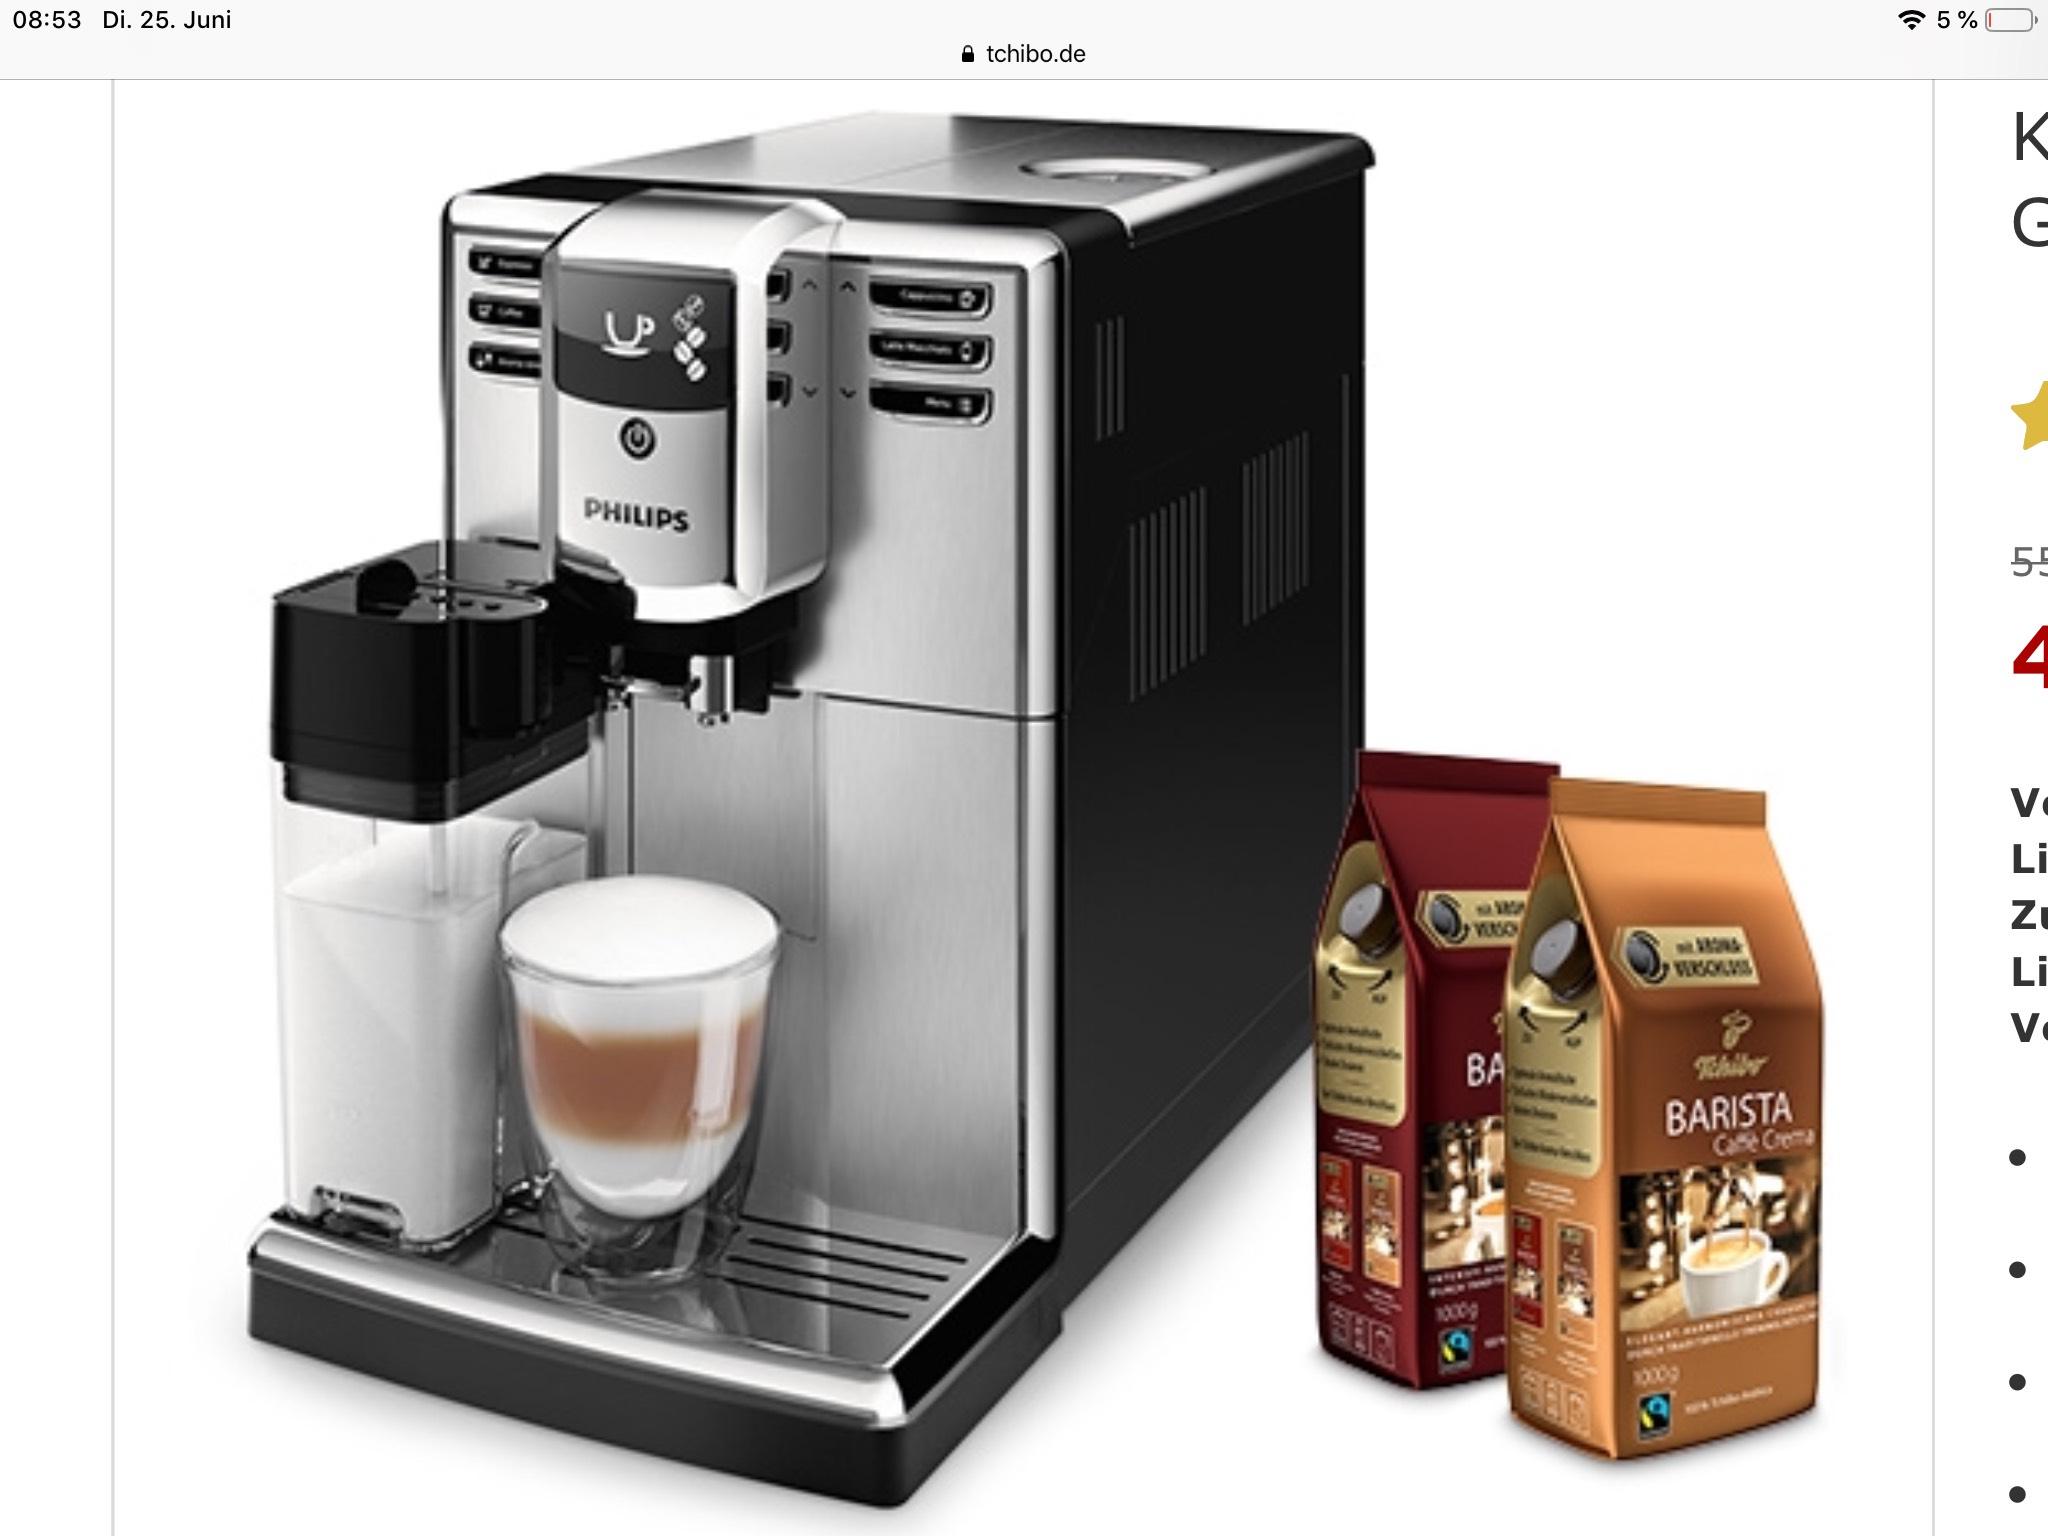 Kaffeevollautomat Philips EP5365/10 5000 Serie Kaffeevollautomat, silber (inkl. Gratis-Kaffee)